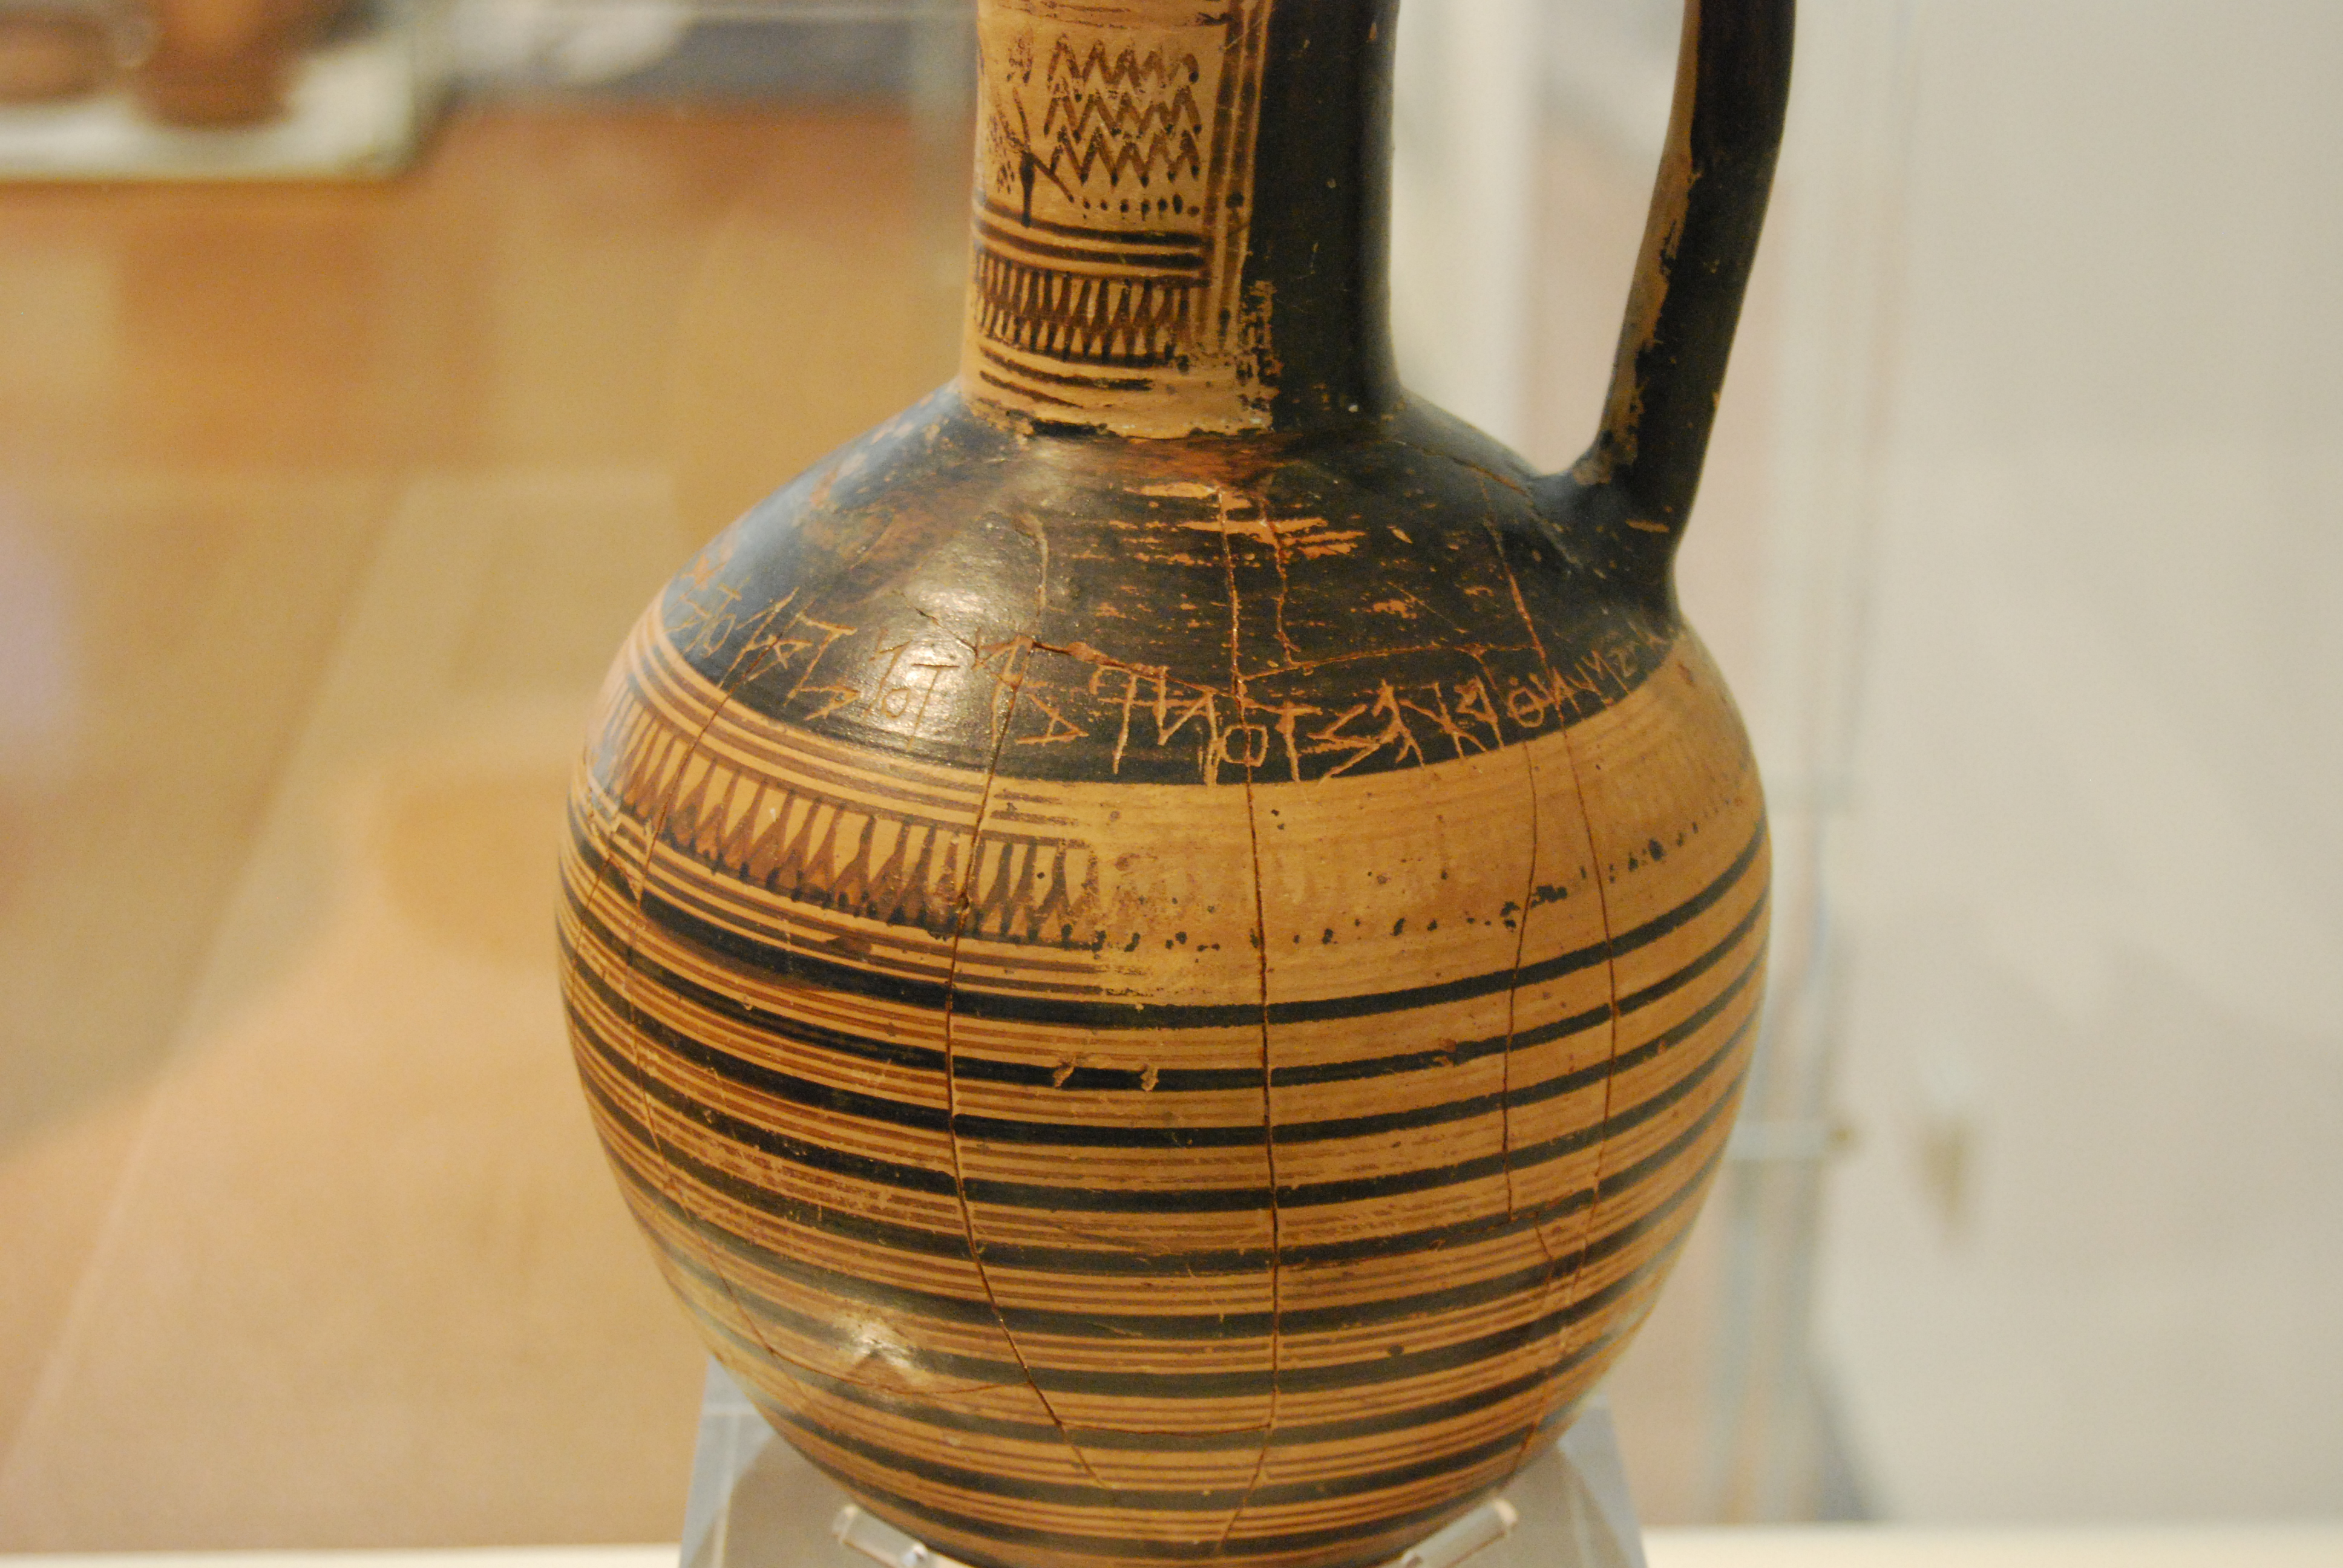 Eteocypriot language